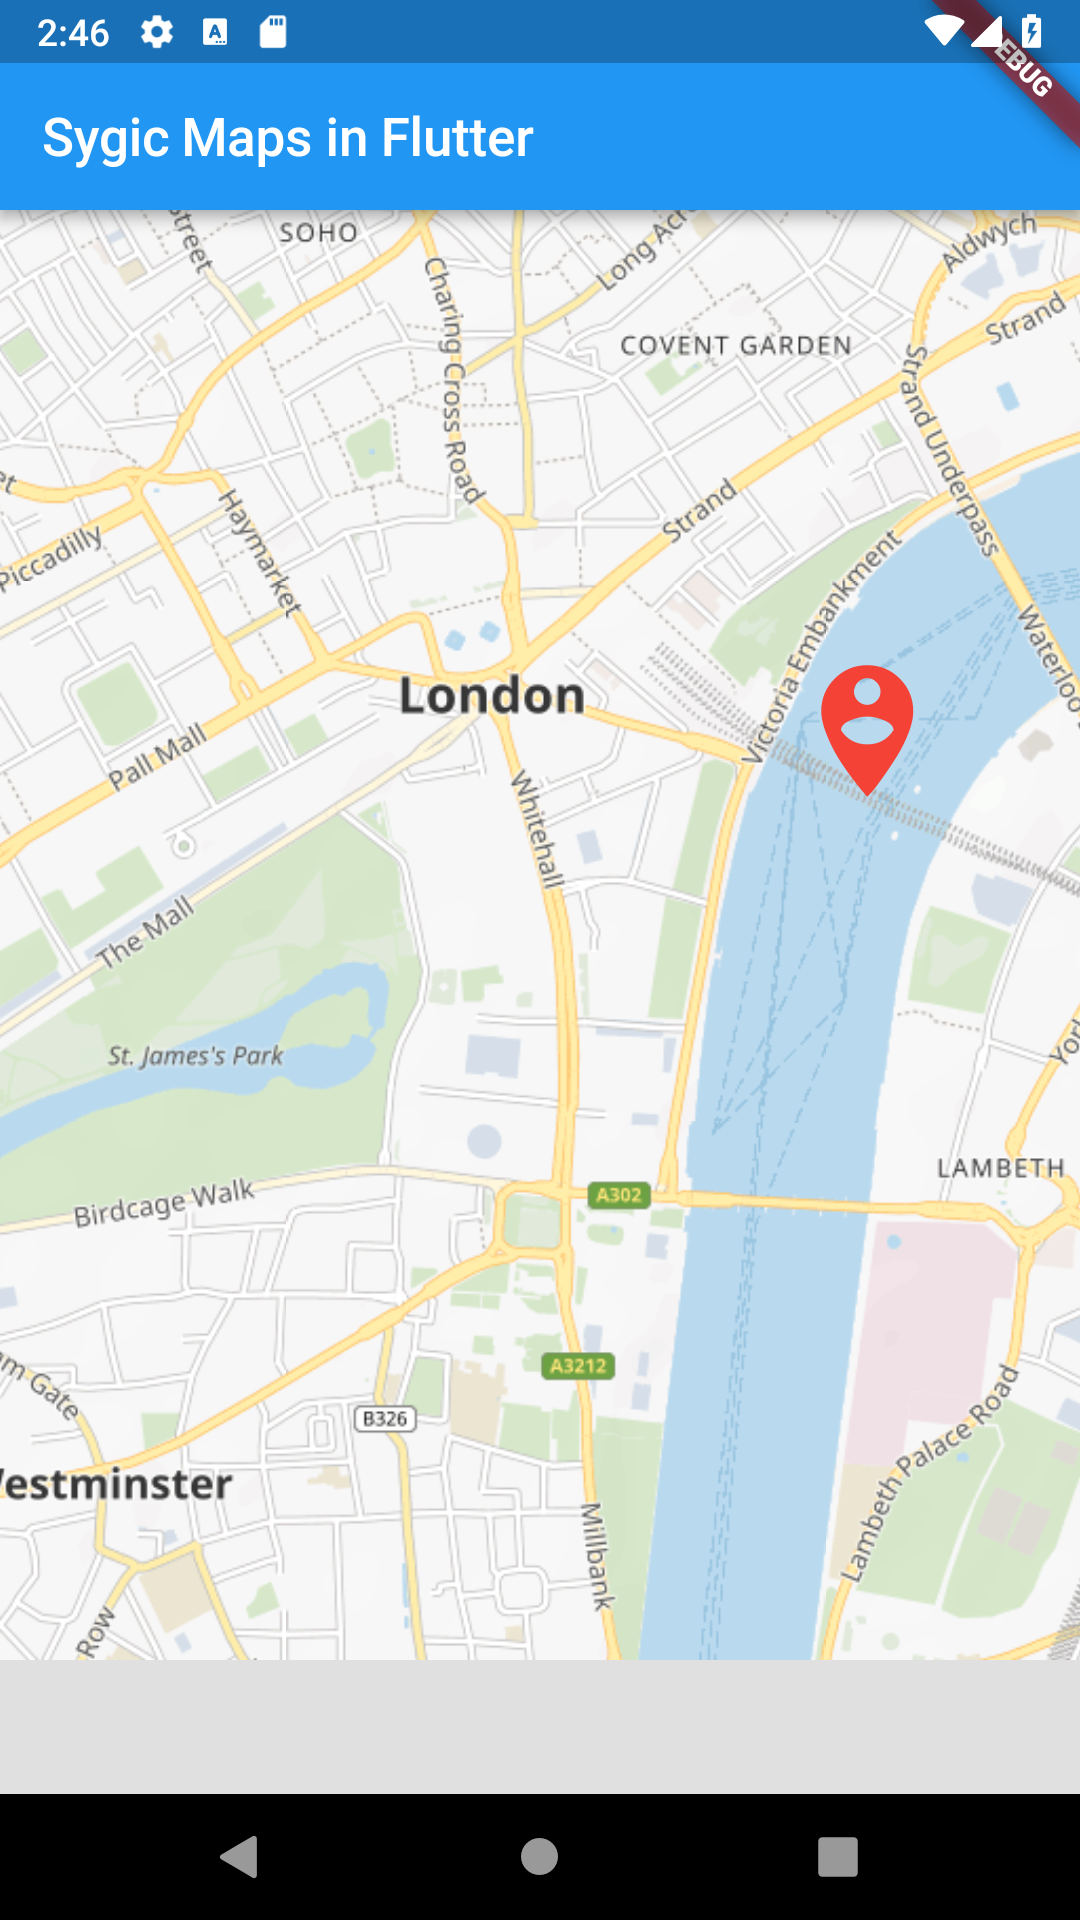 GitHub - Sygic/Sygic-Maps-in-Flutter